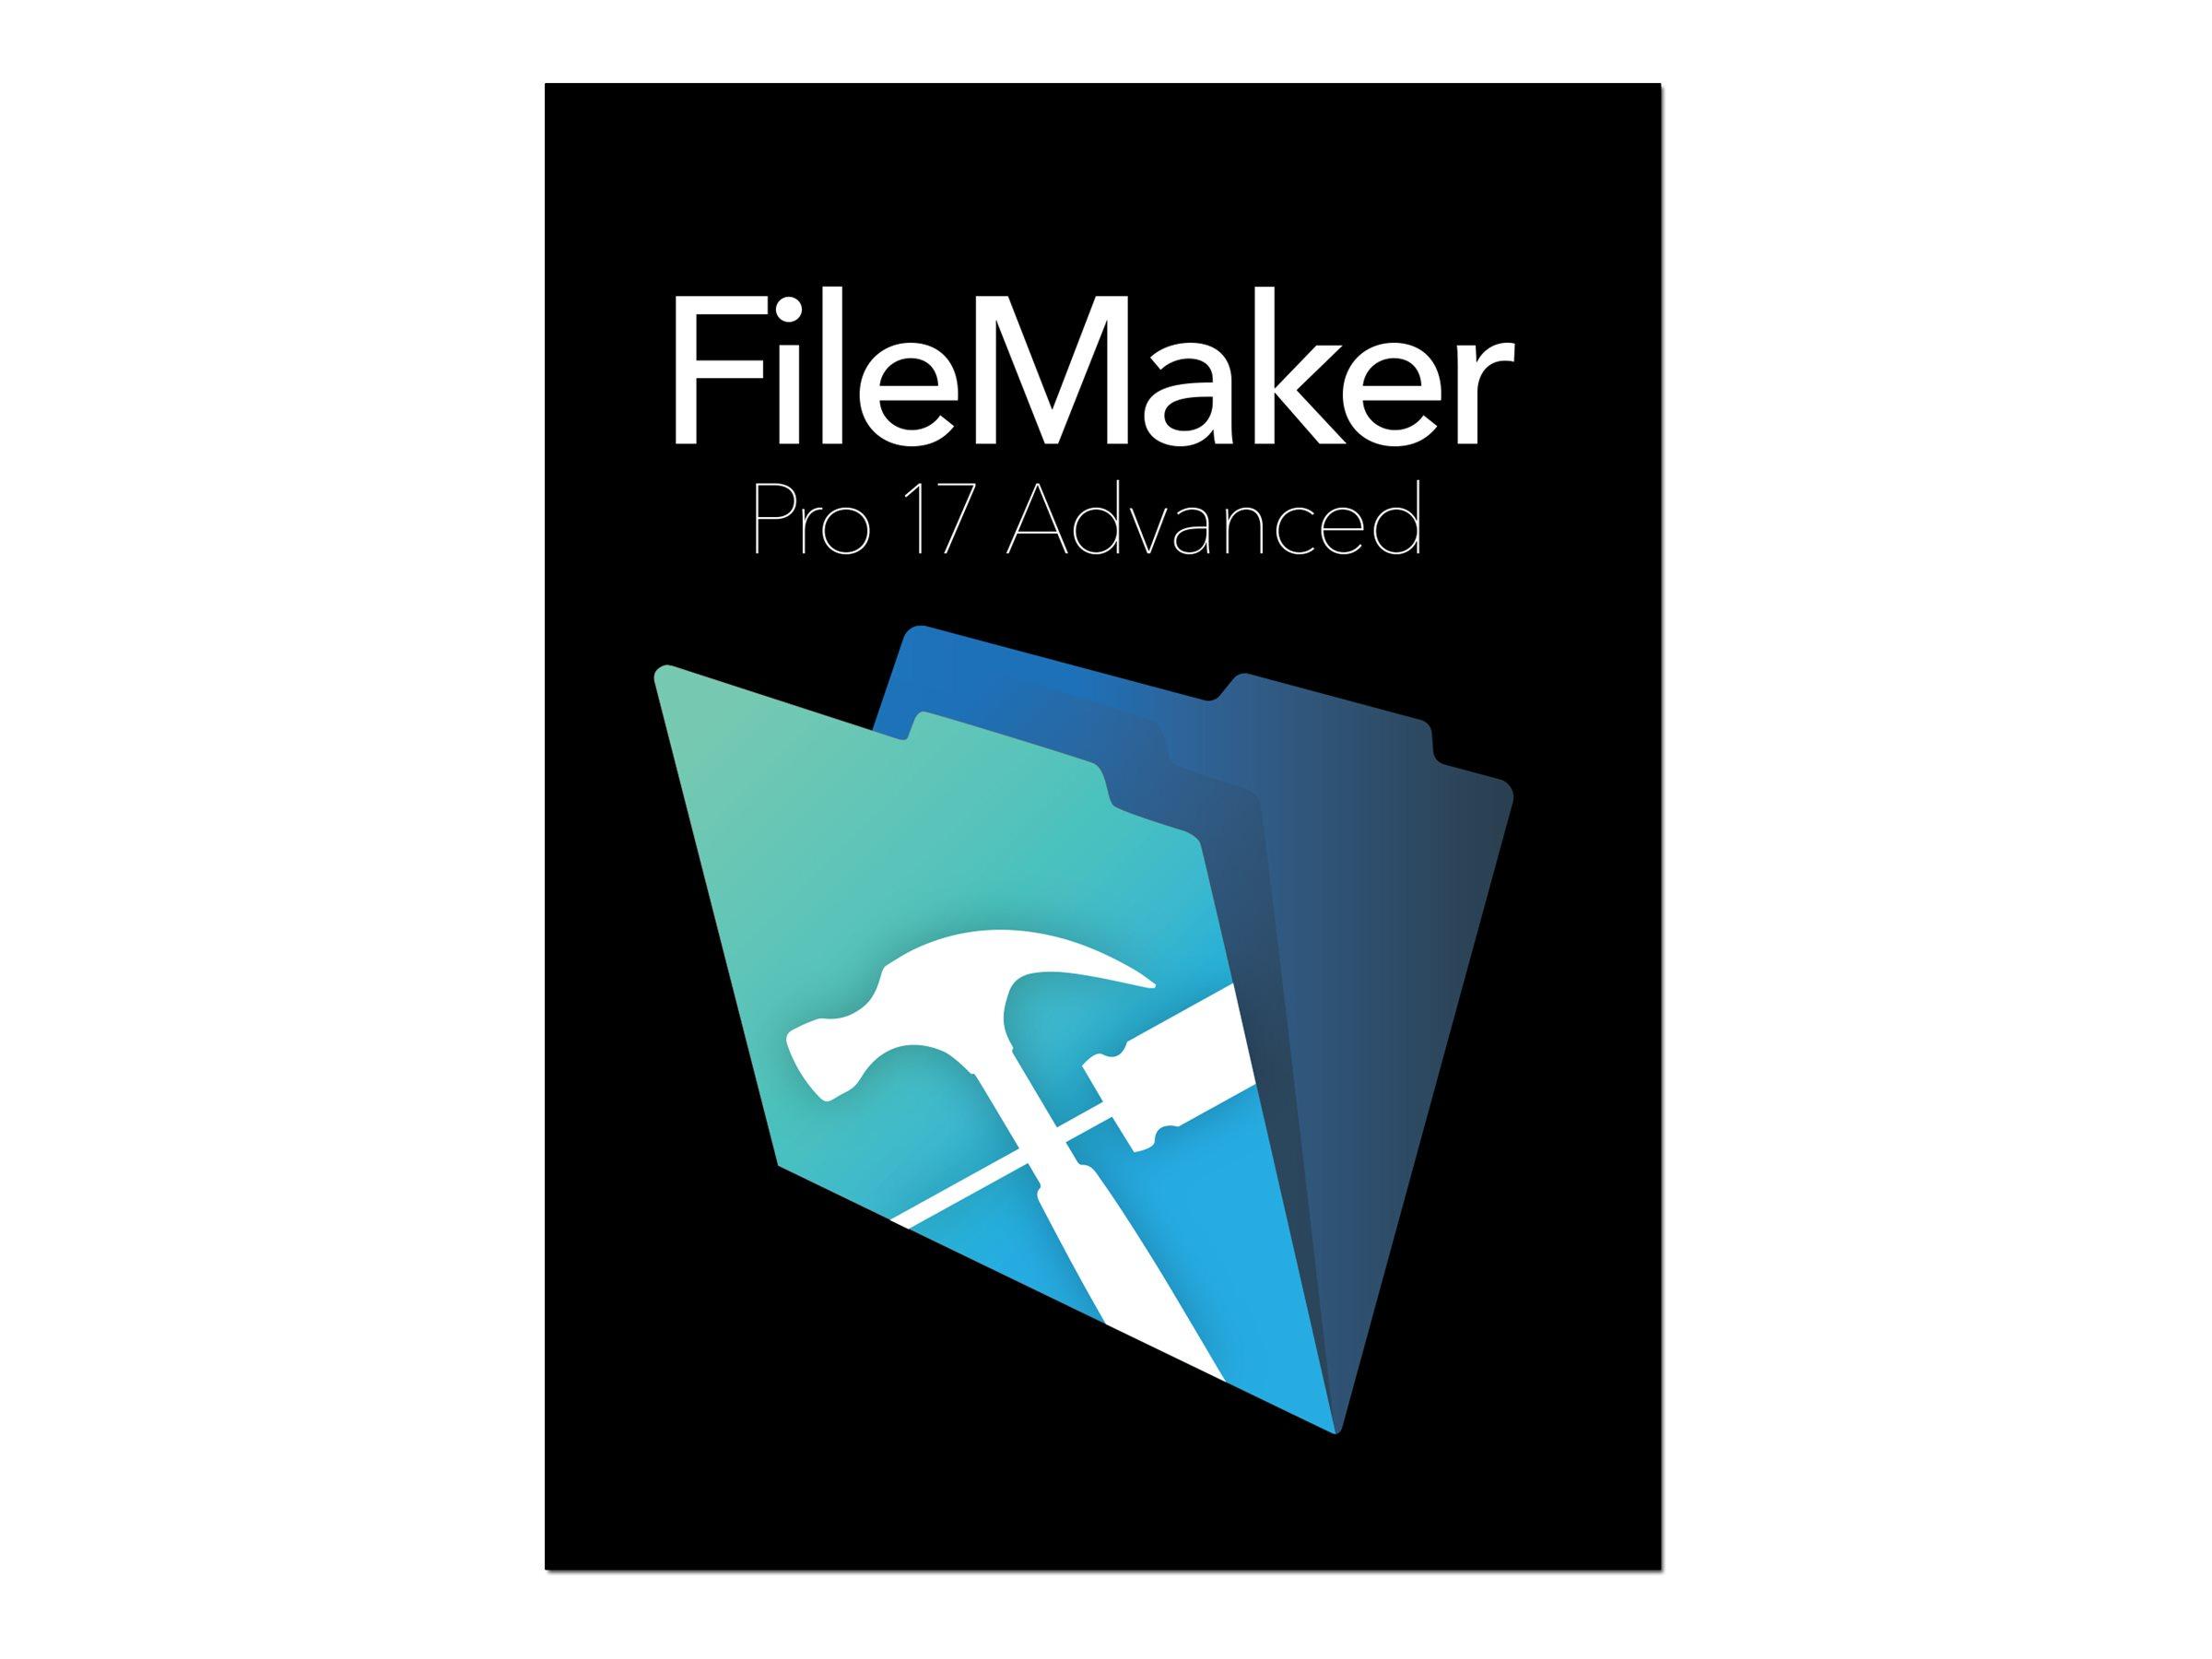 FileMaker Pro Advanced - (v. 17) - Box-Pack - Win, Mac